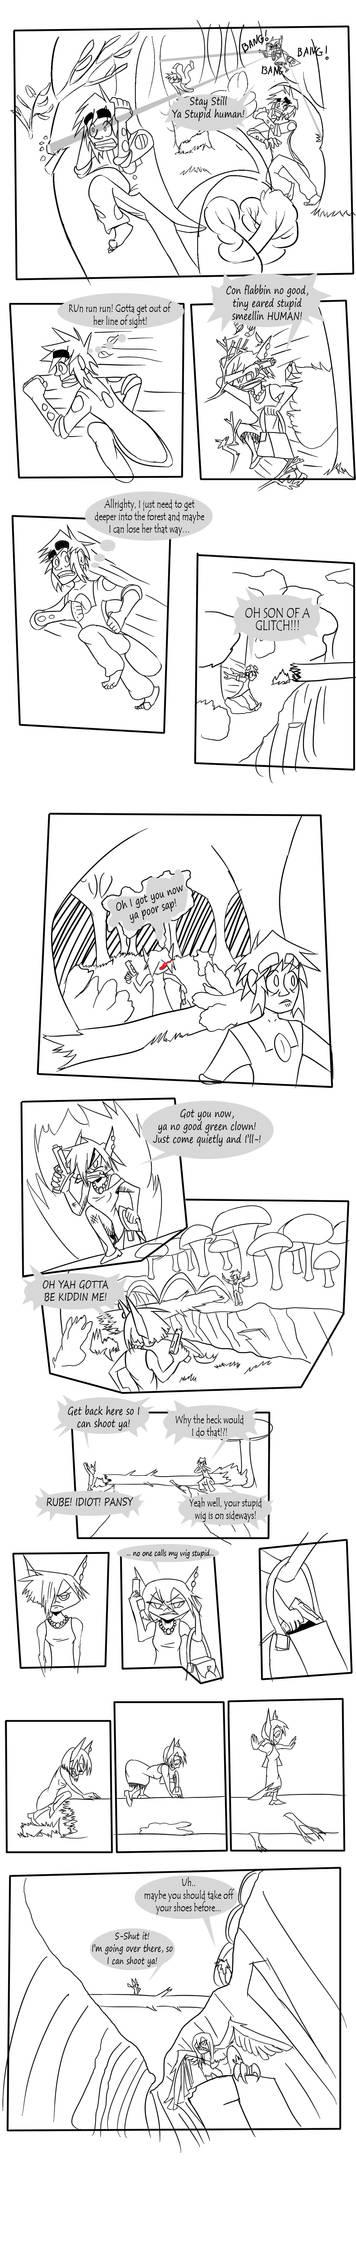 round 1 versus Ever page 4